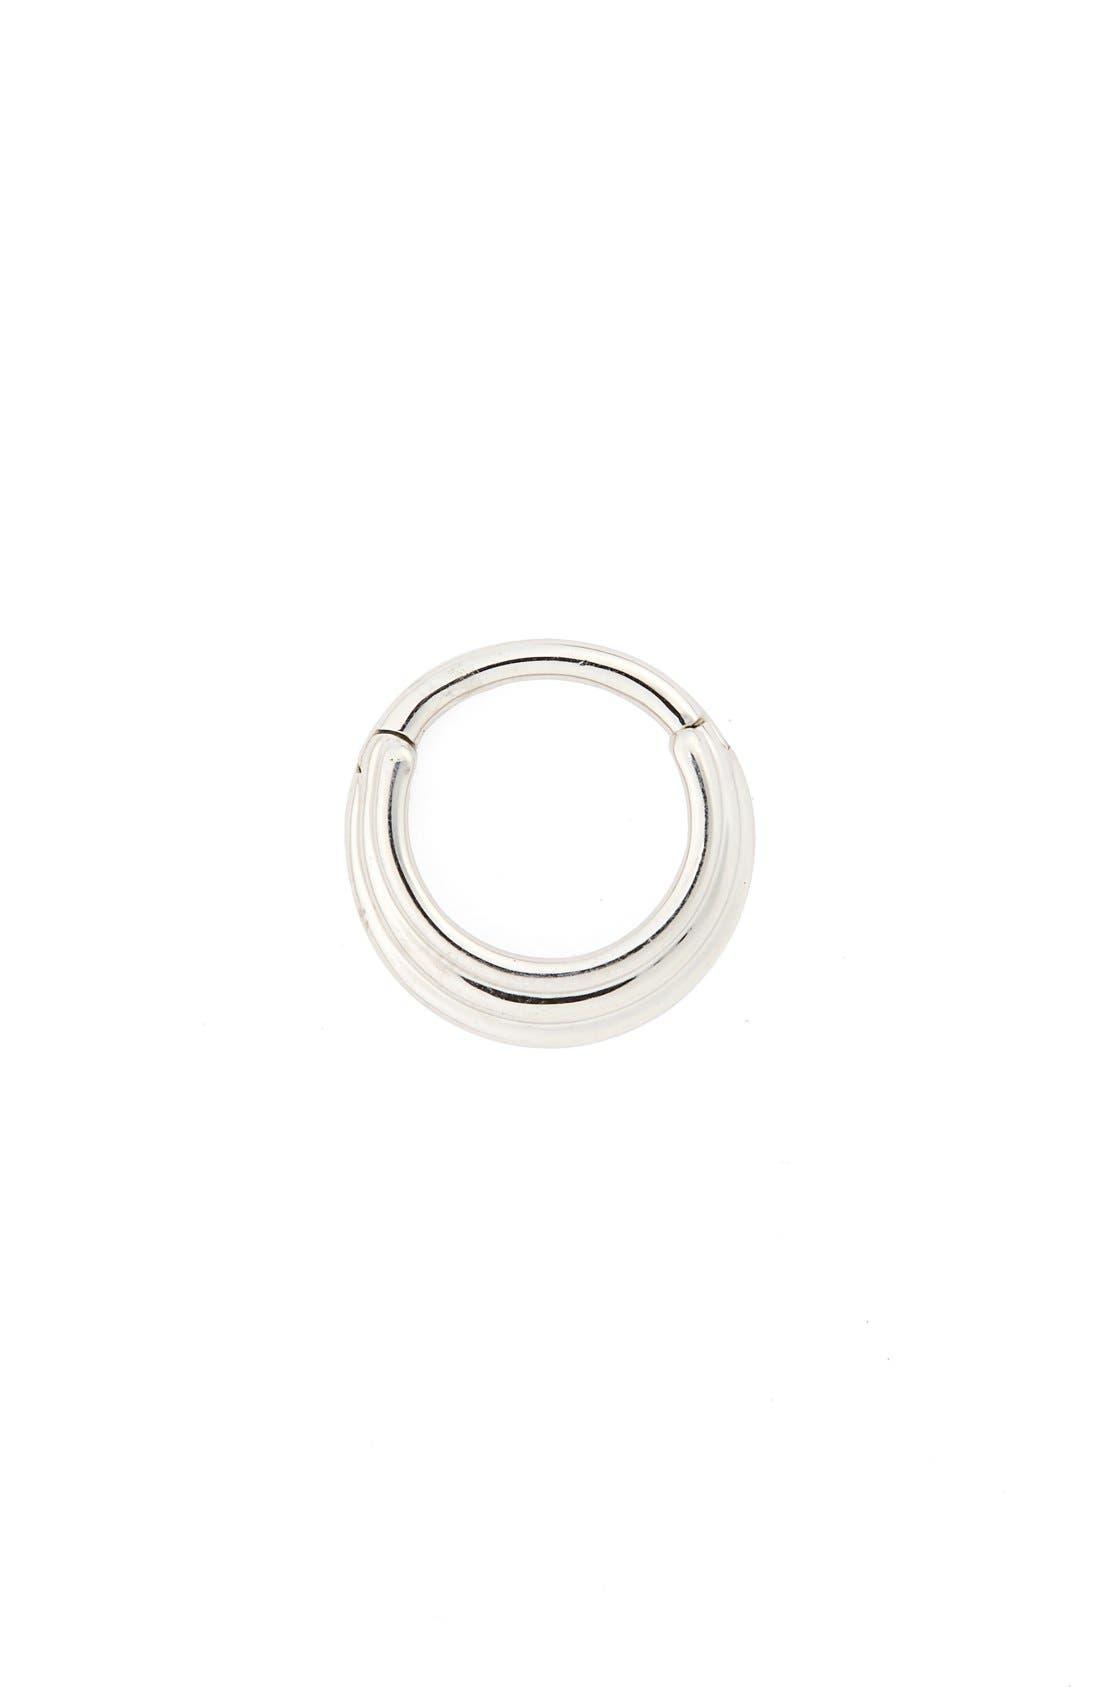 Maria Tash 16 Gauge Hiranya Clicker Ring